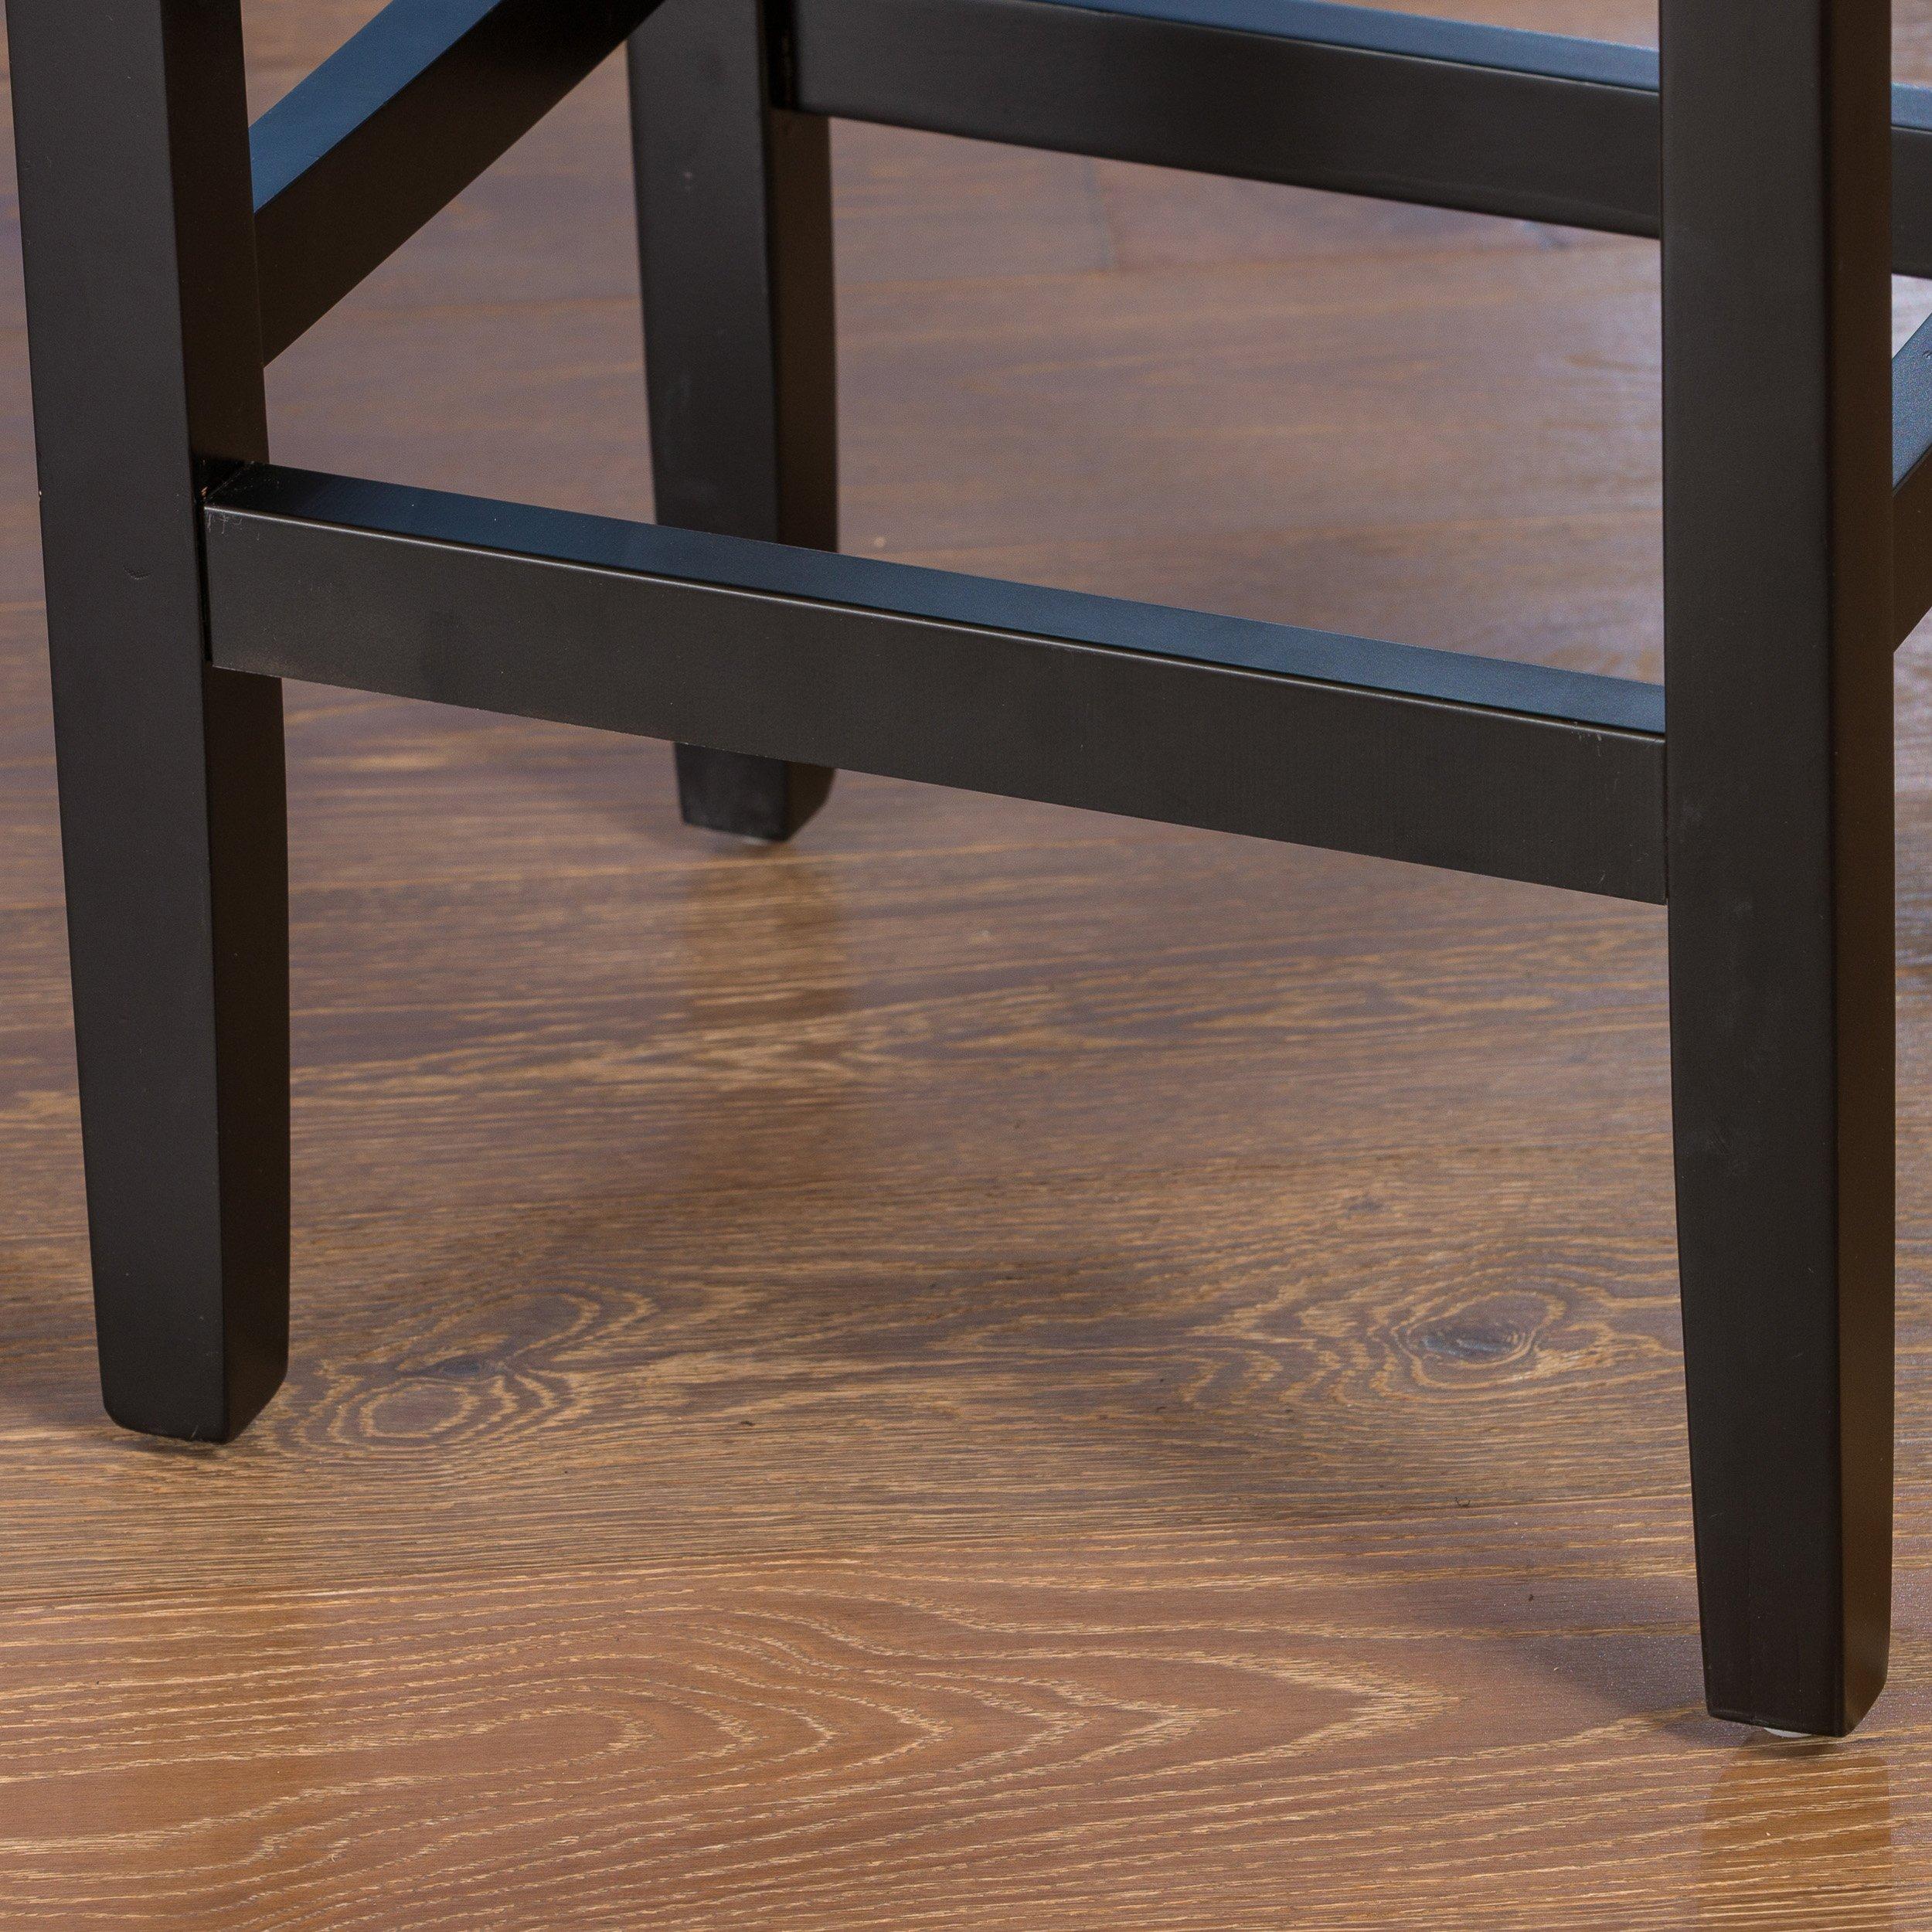 Chantal Backless Black Leather Counter Stools w/ Chrome Nailheads (Set of 2)